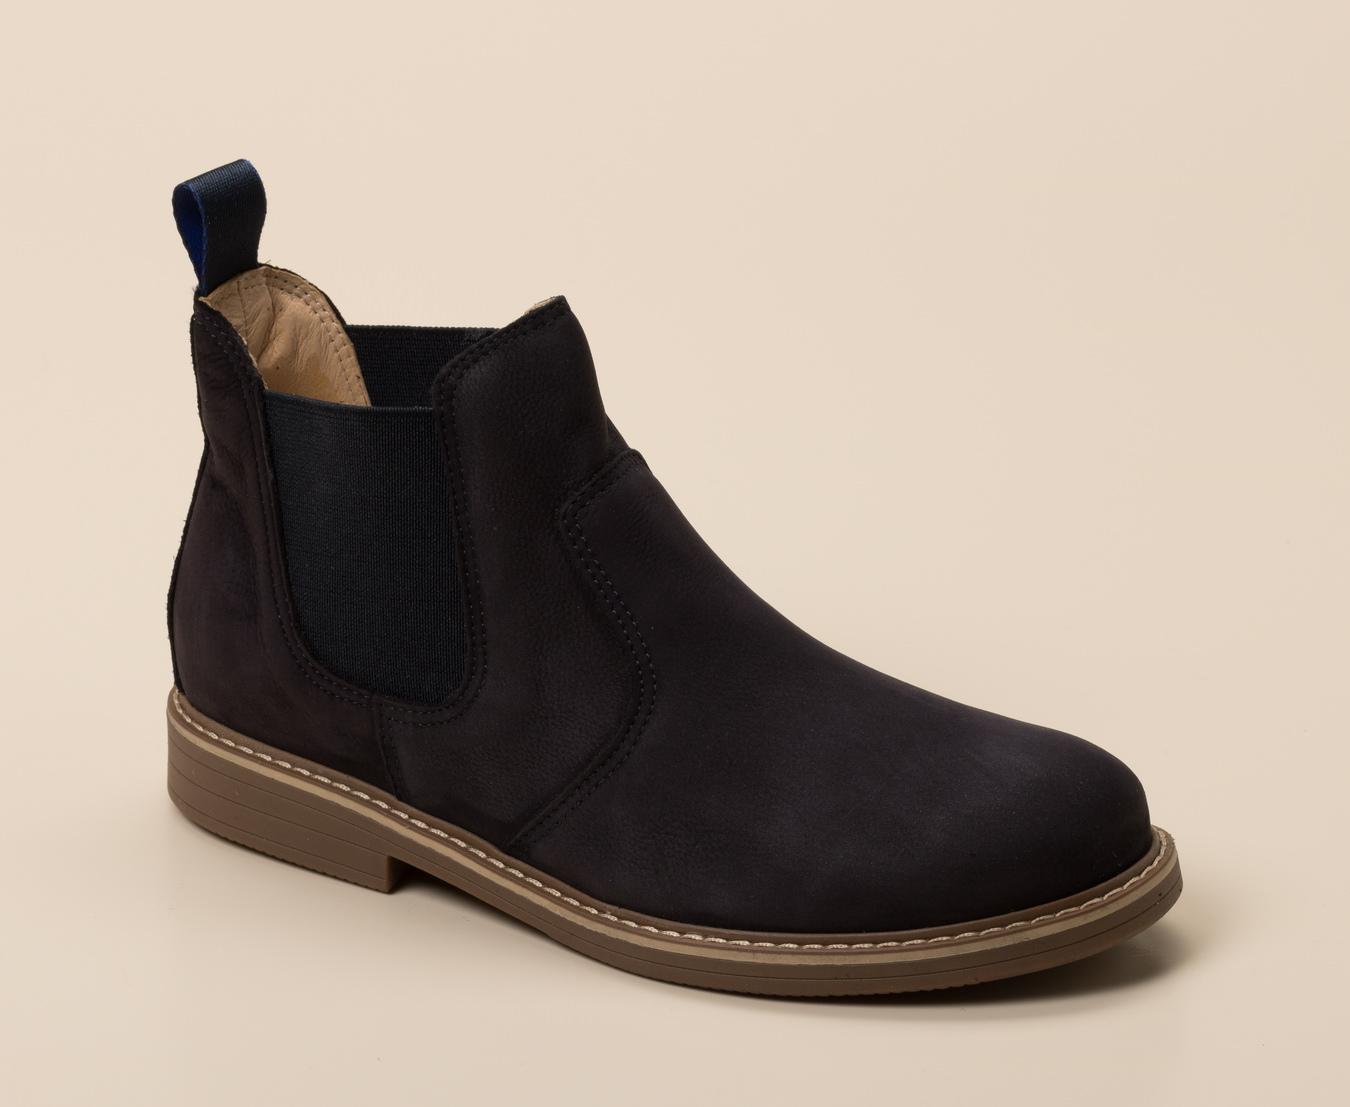 ac7e69e2af9019 Ralph Harrison Classic Kinder Chelsea-Boots in dunkelblau kaufen ...